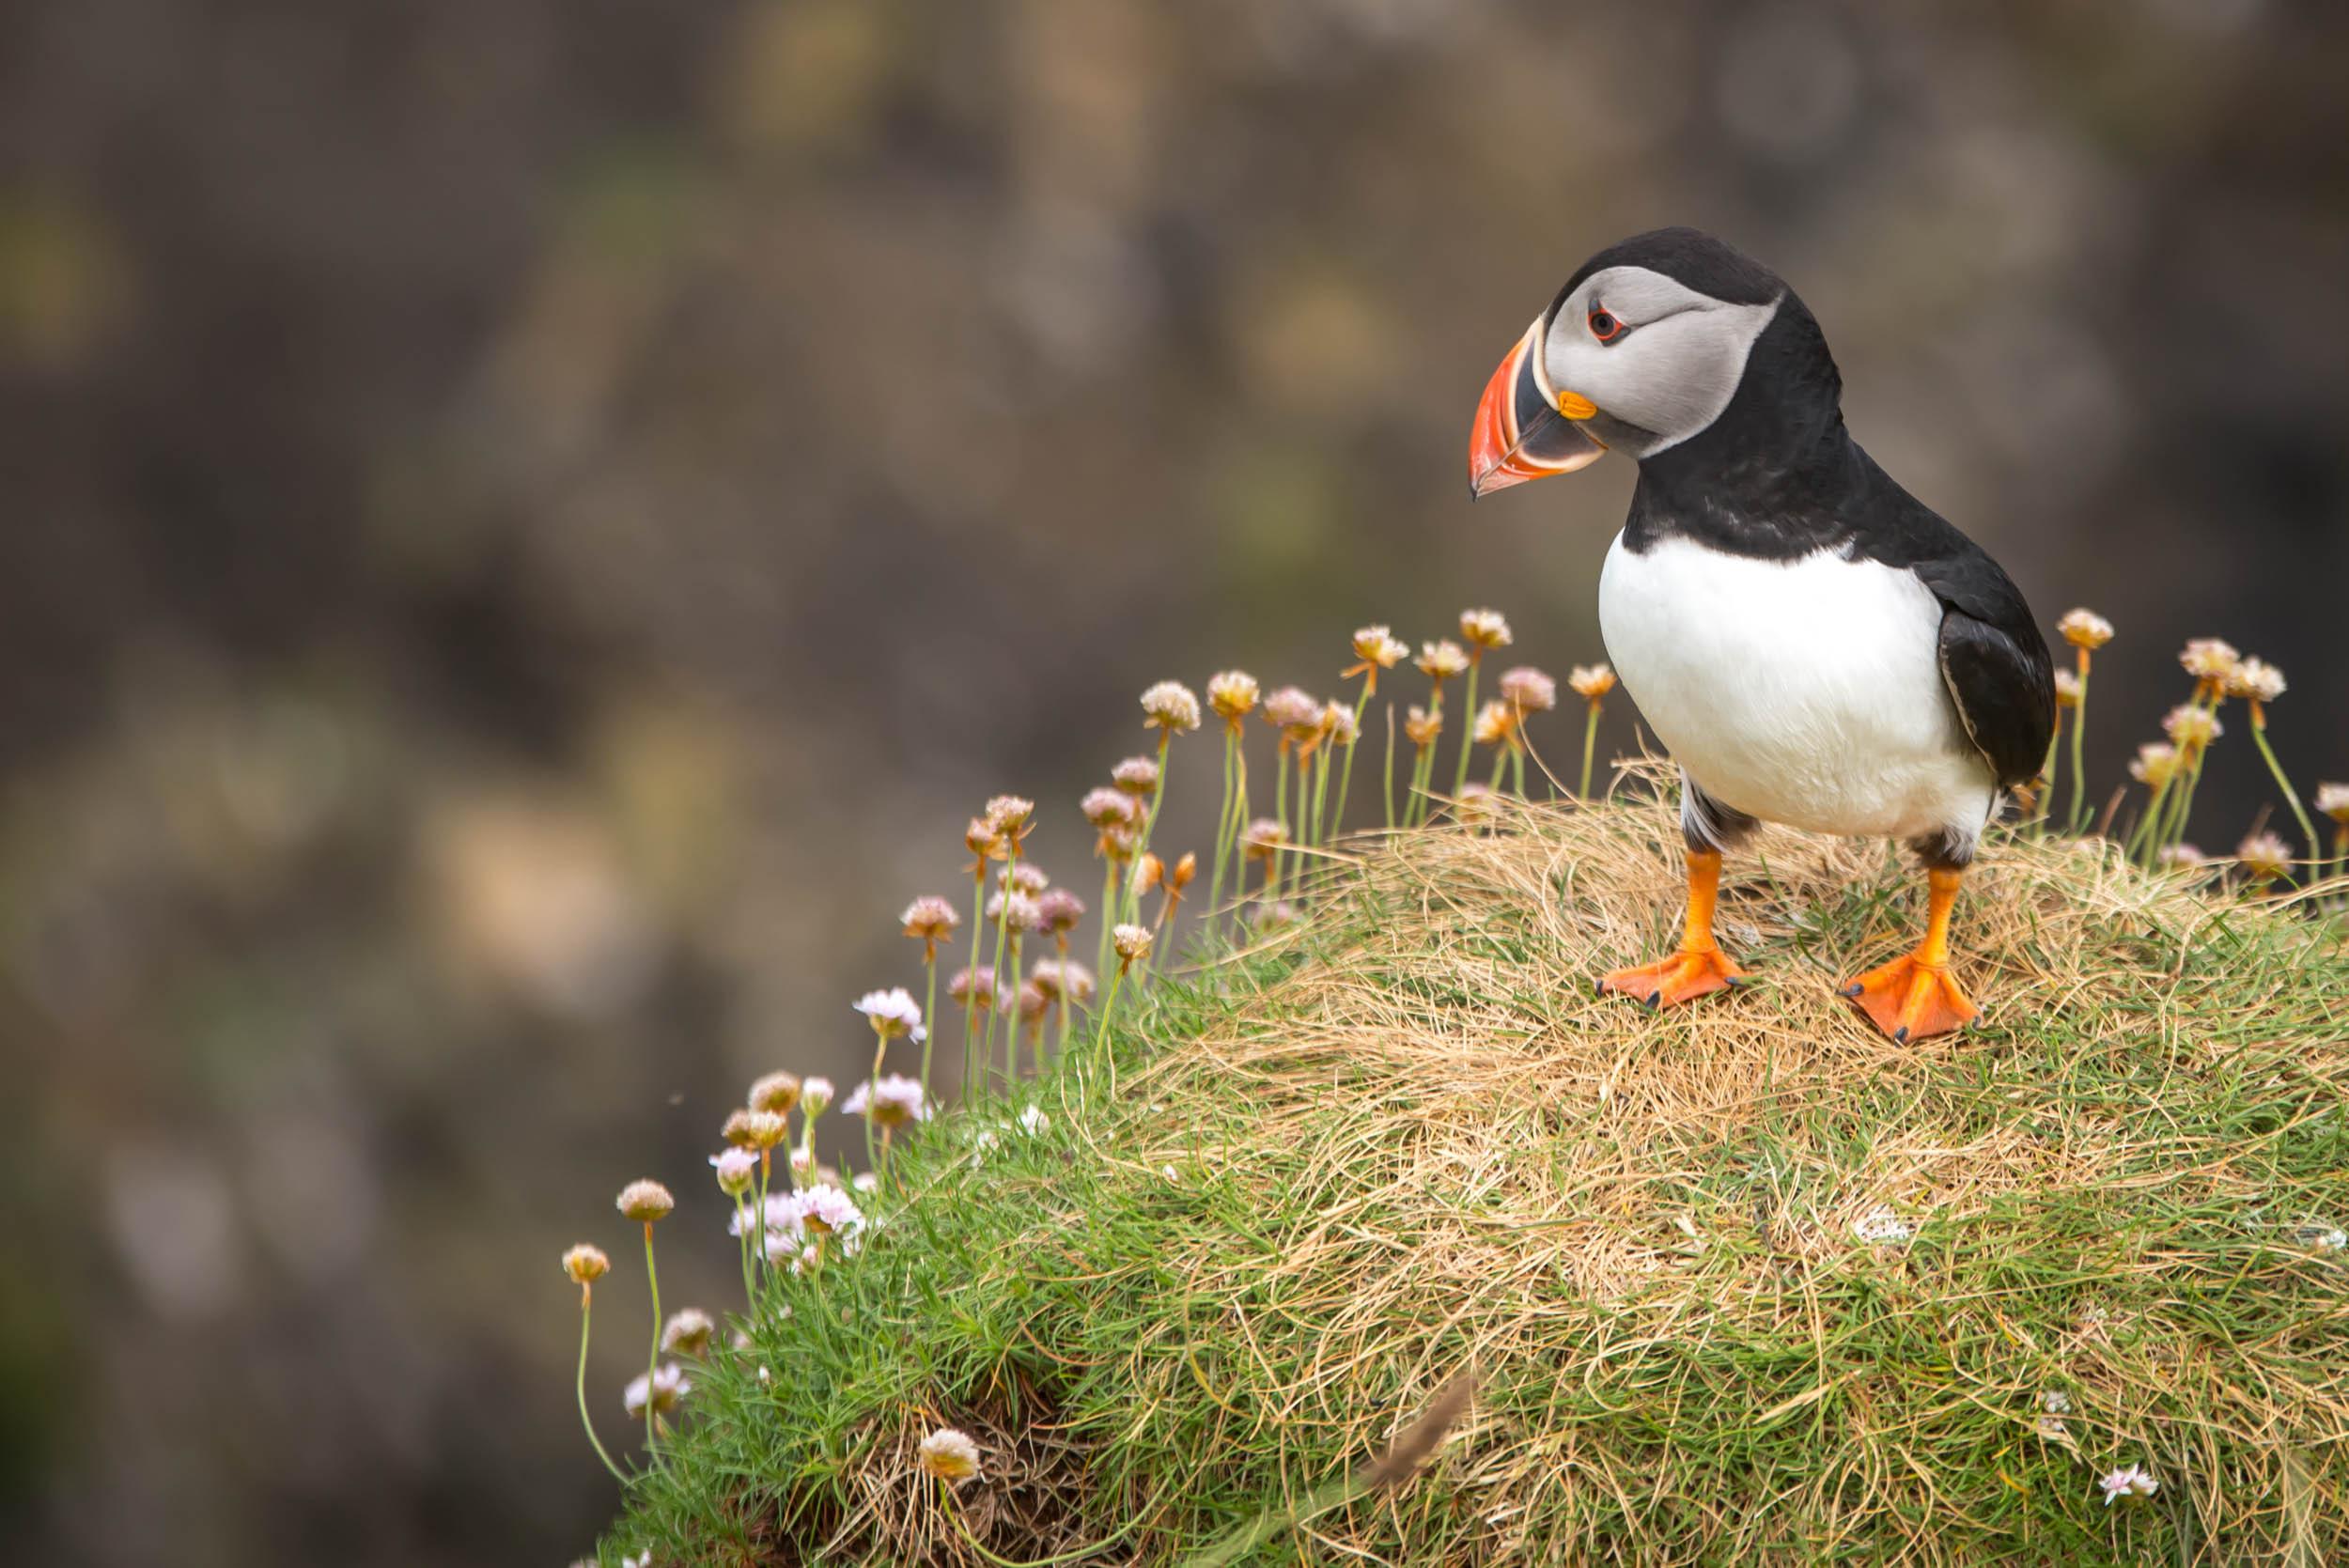 Puffins on the Isle of Staffa, Scotland